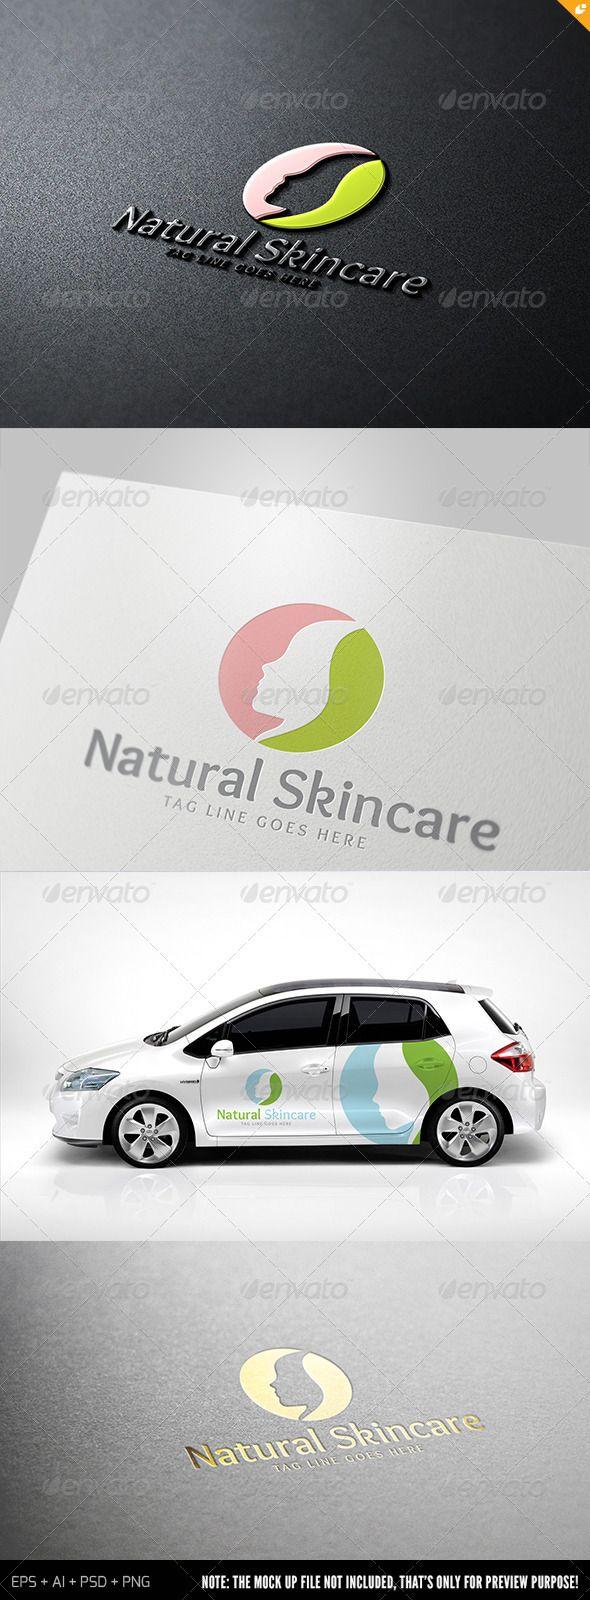 Natural Skincare Logo Design Template Vector #logotype Download it here: http://graphicriver.net/item/natural-skincare-logo/7087414?s_rank=221?ref=nesto